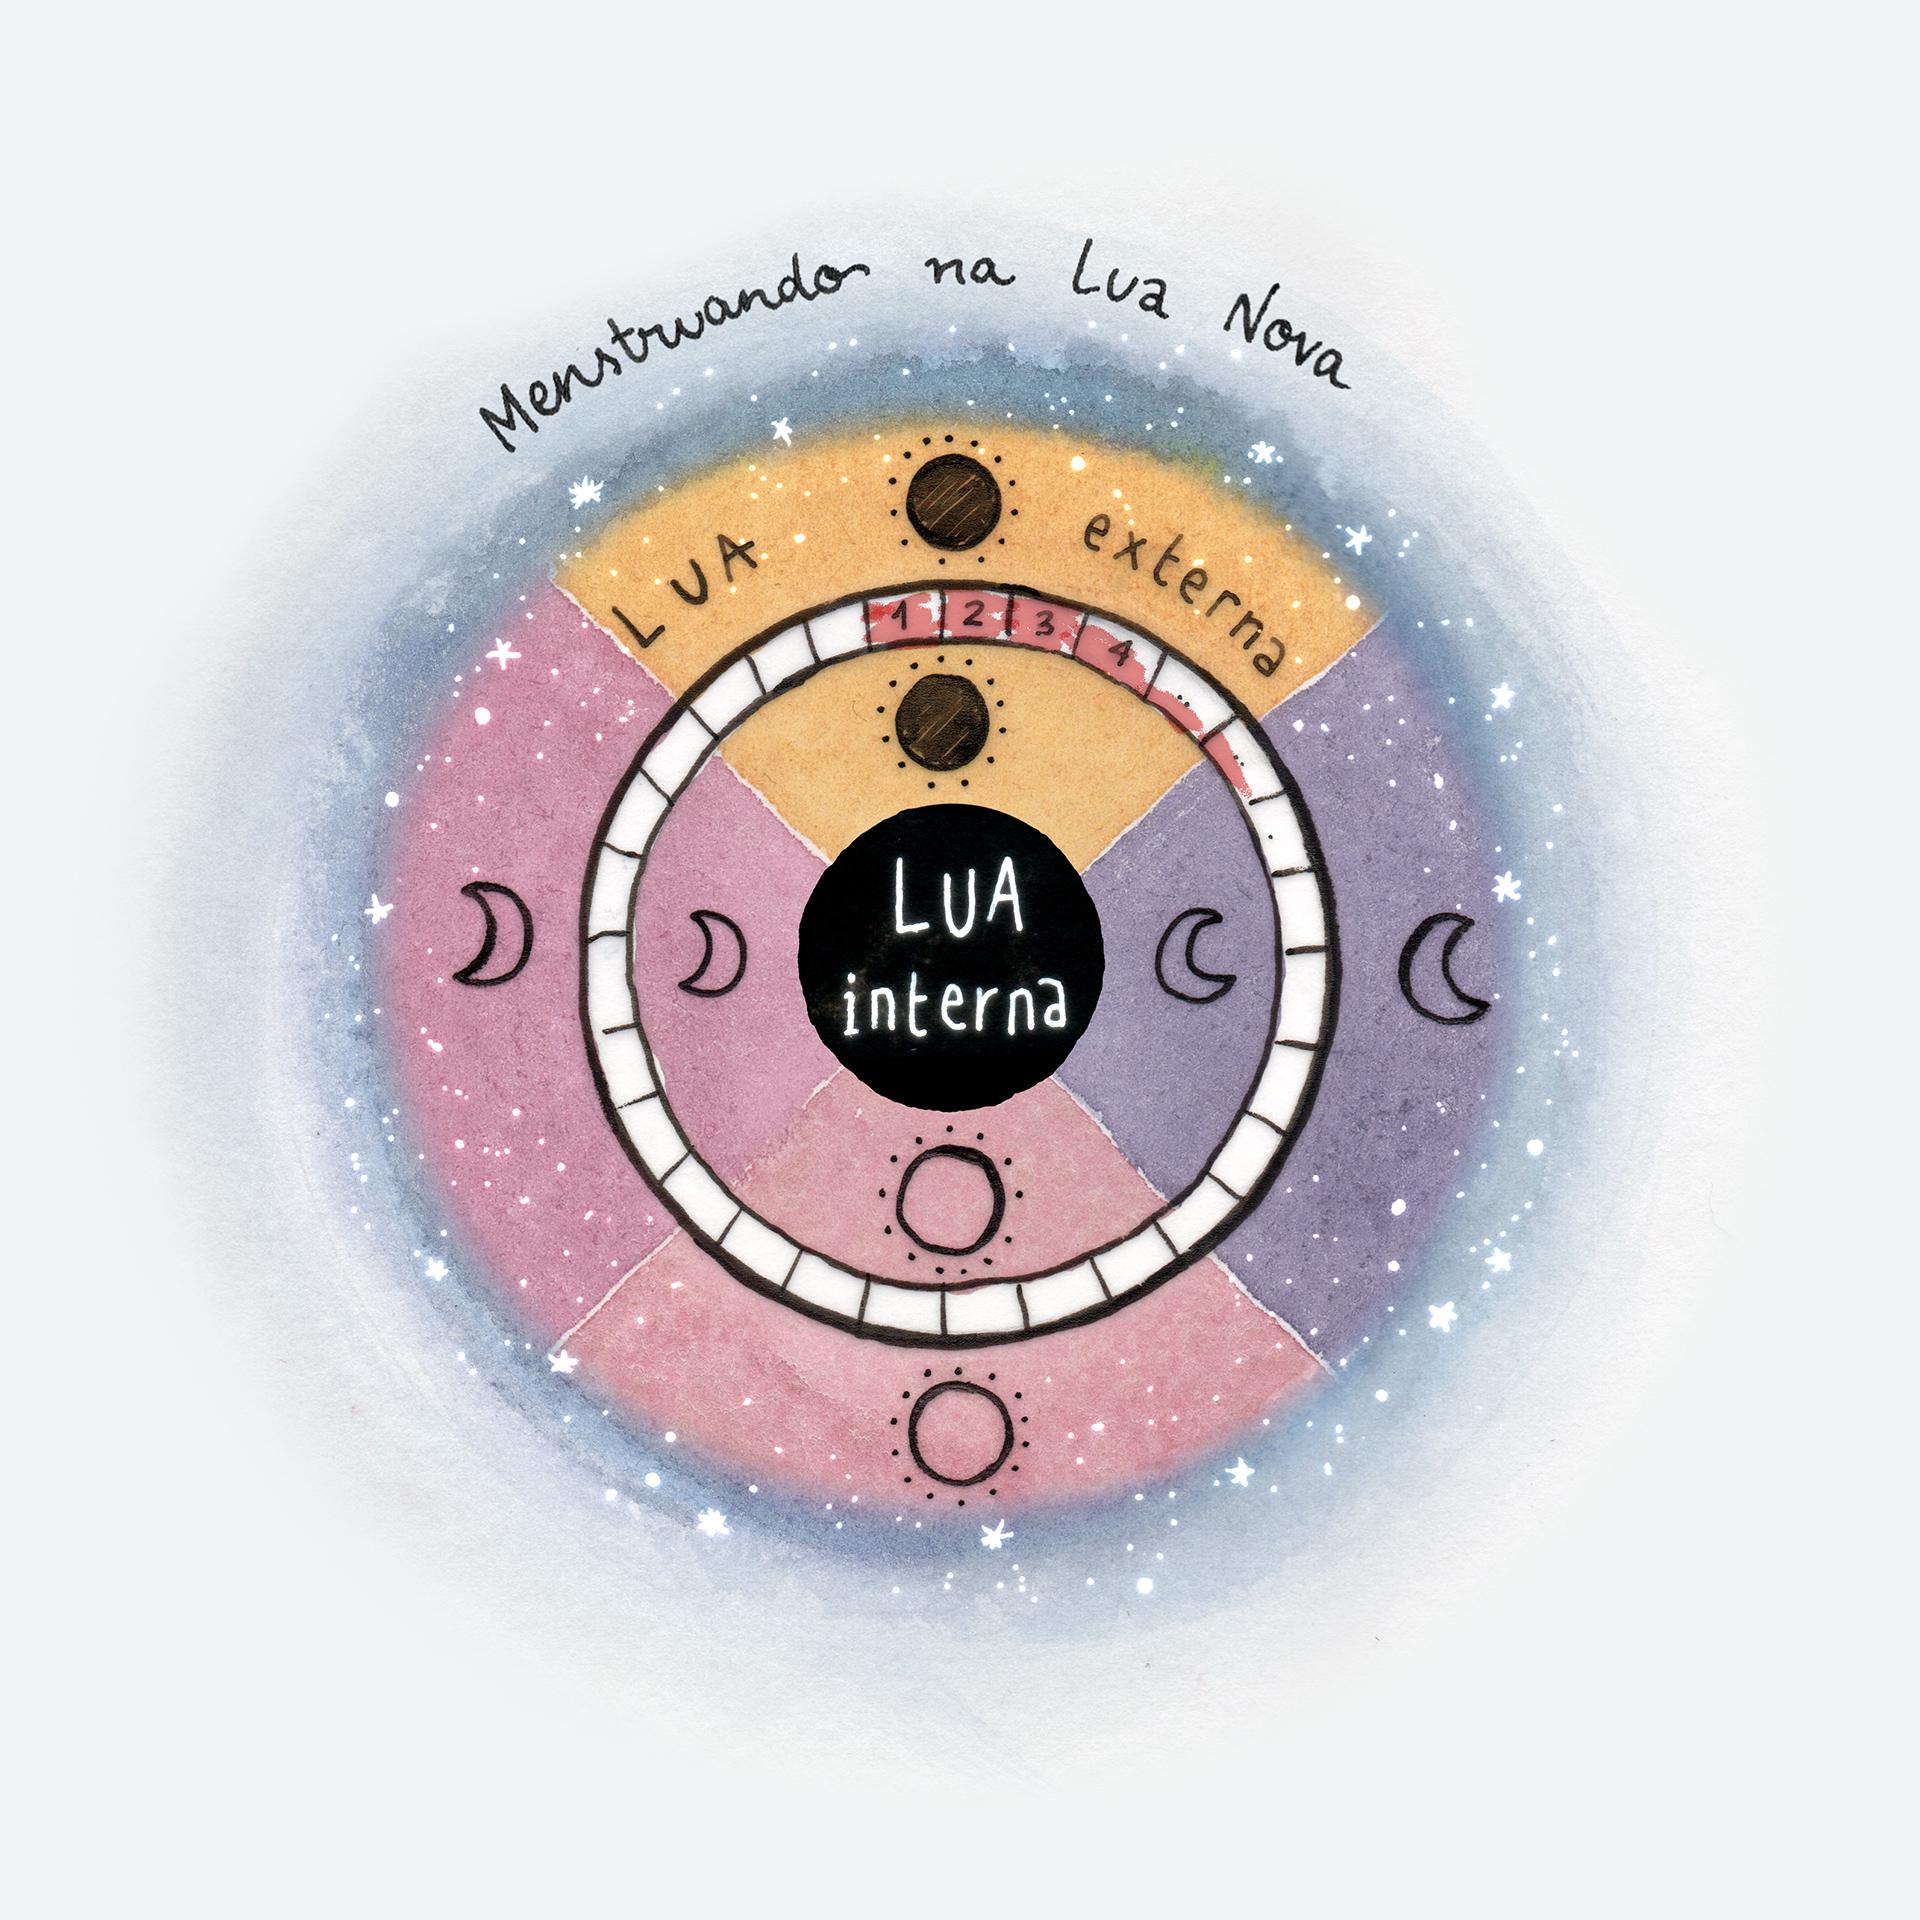 Lua externa, Lua interna